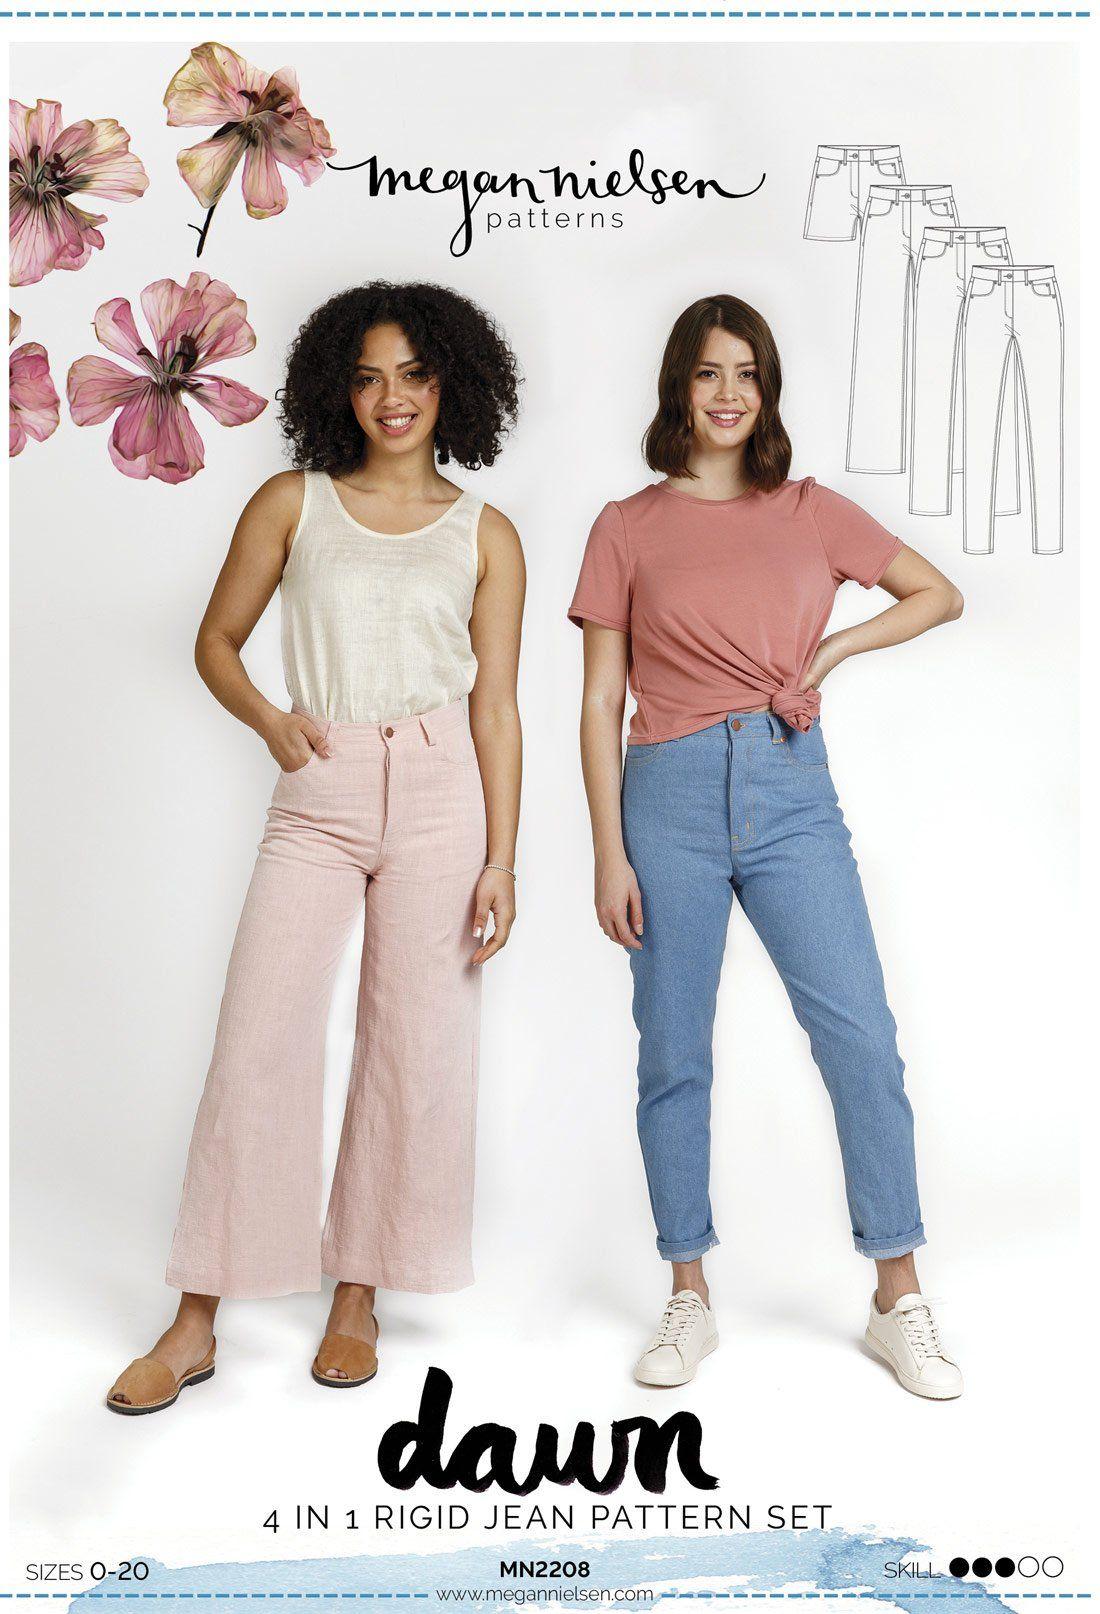 Dawn Jeans Sewing Pattern